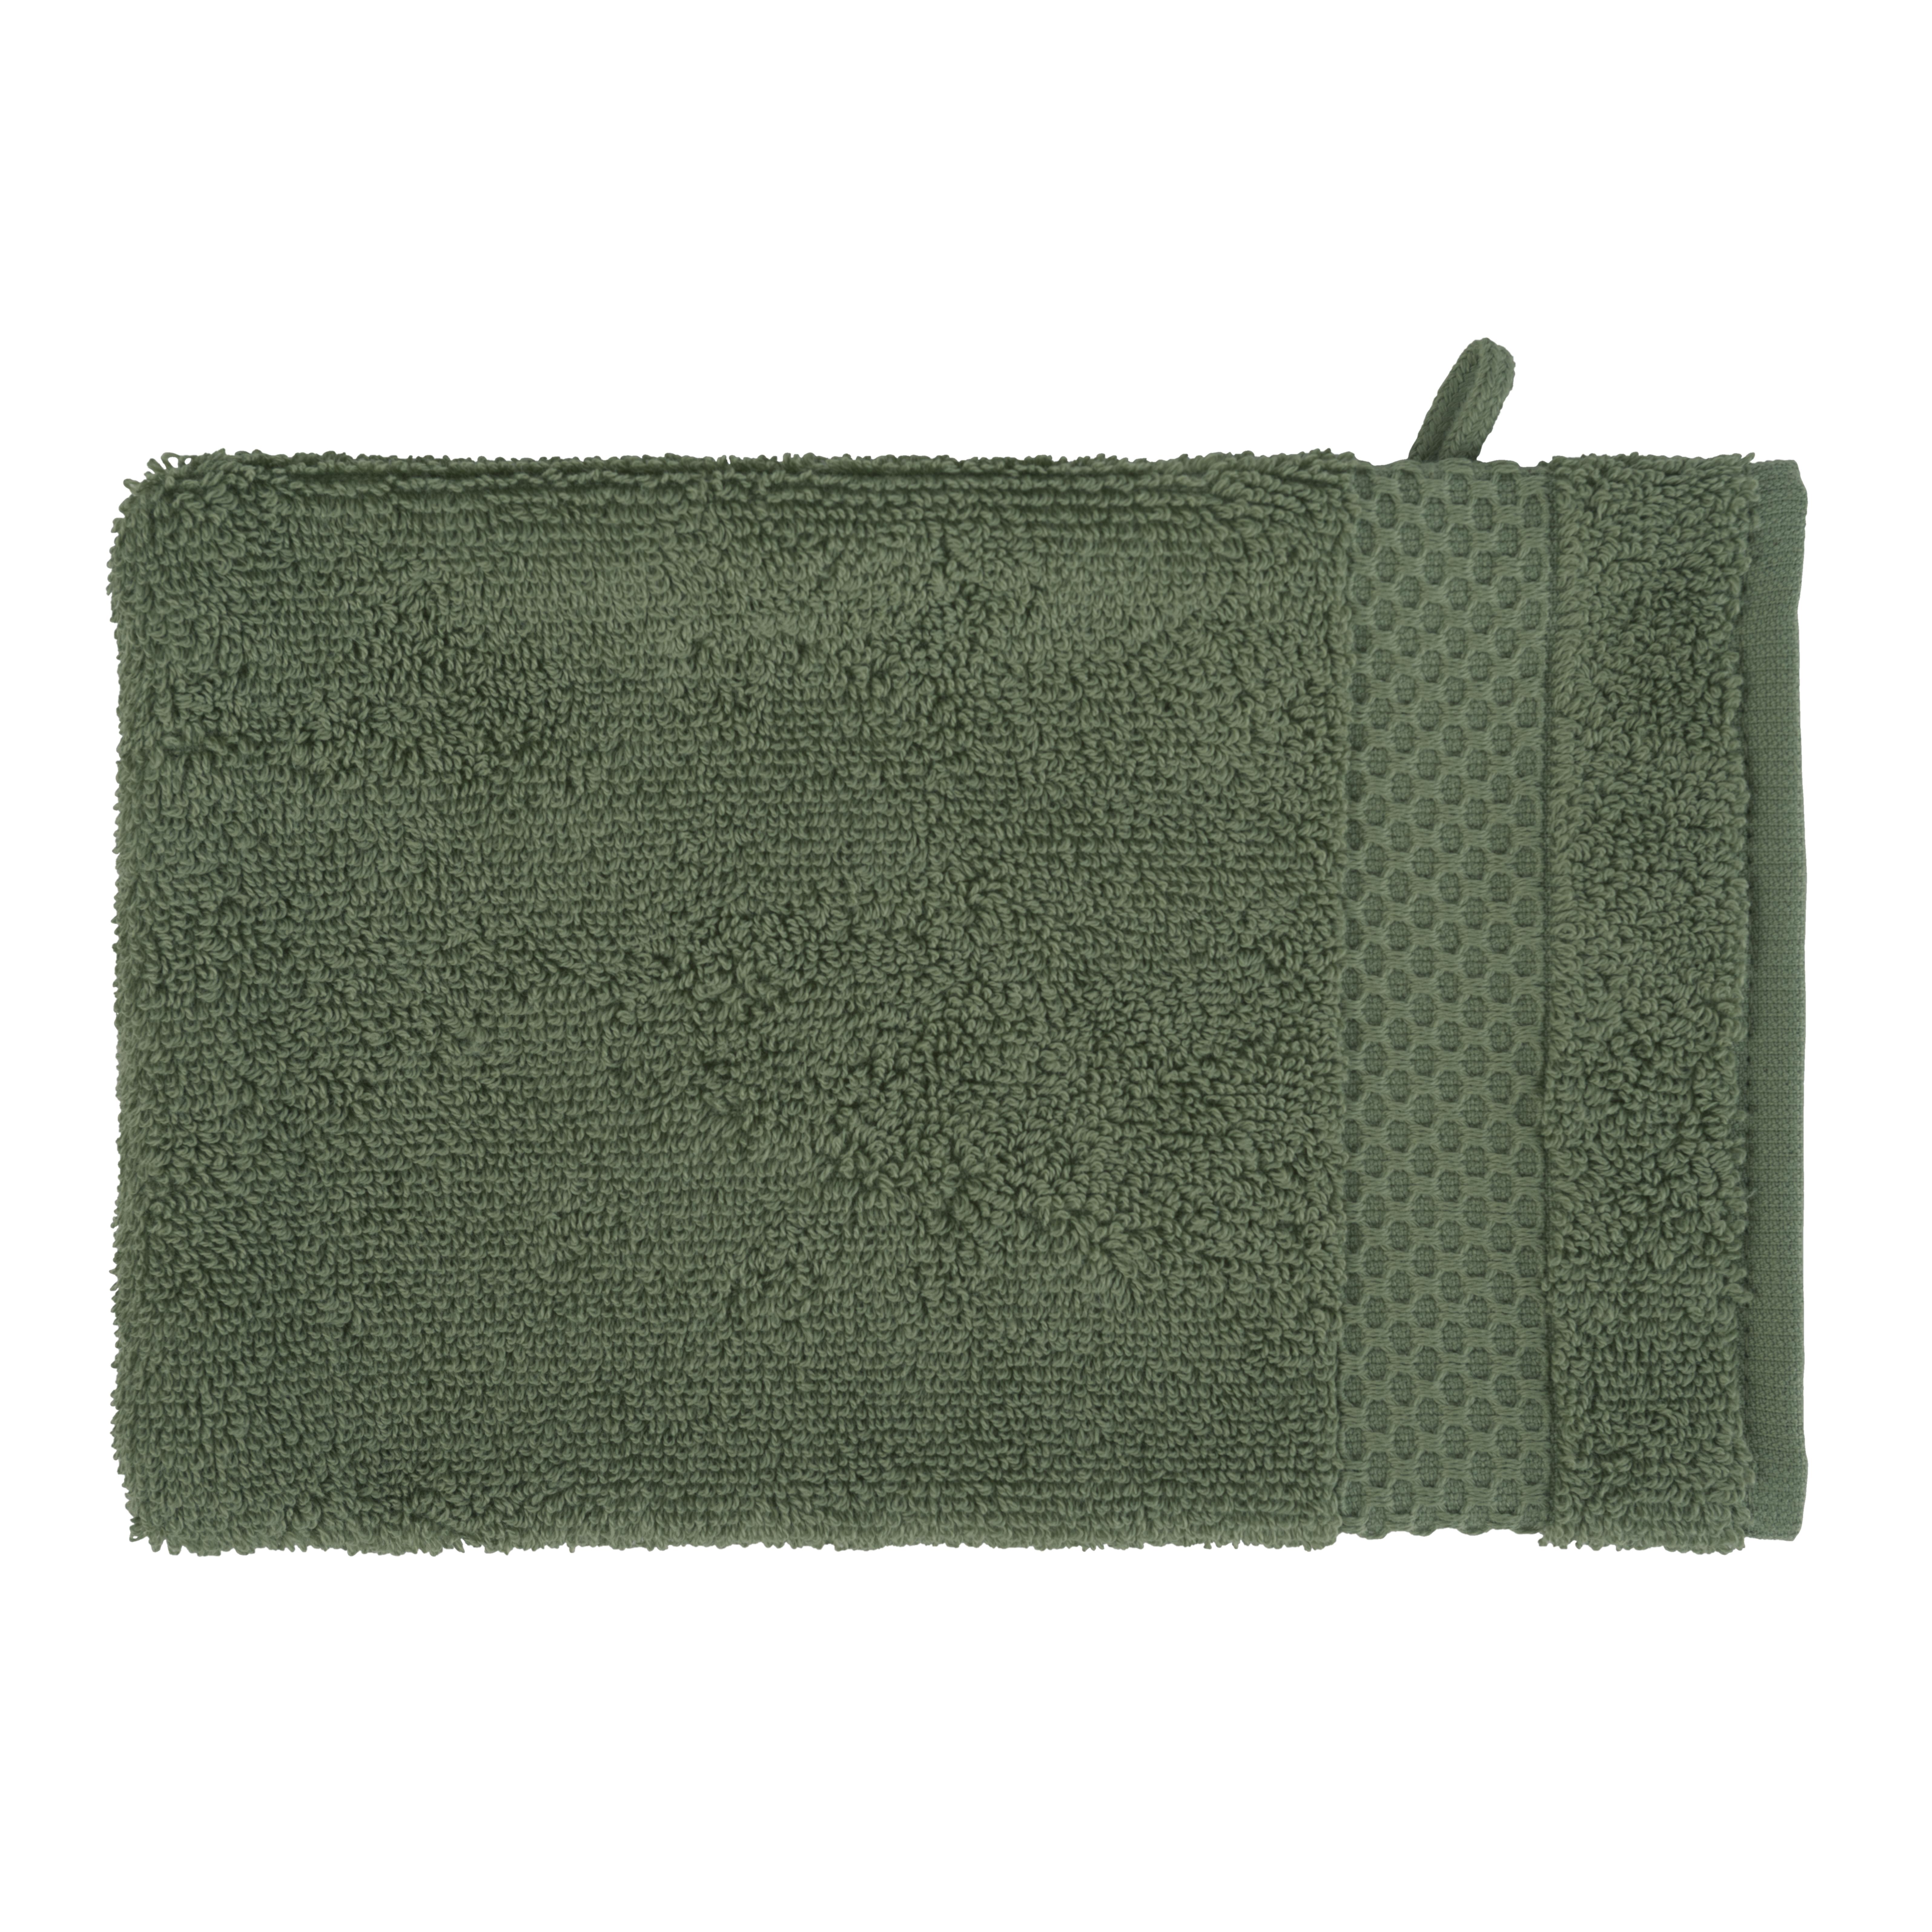 Clarysse Florence washandjes 2 stuks Groen